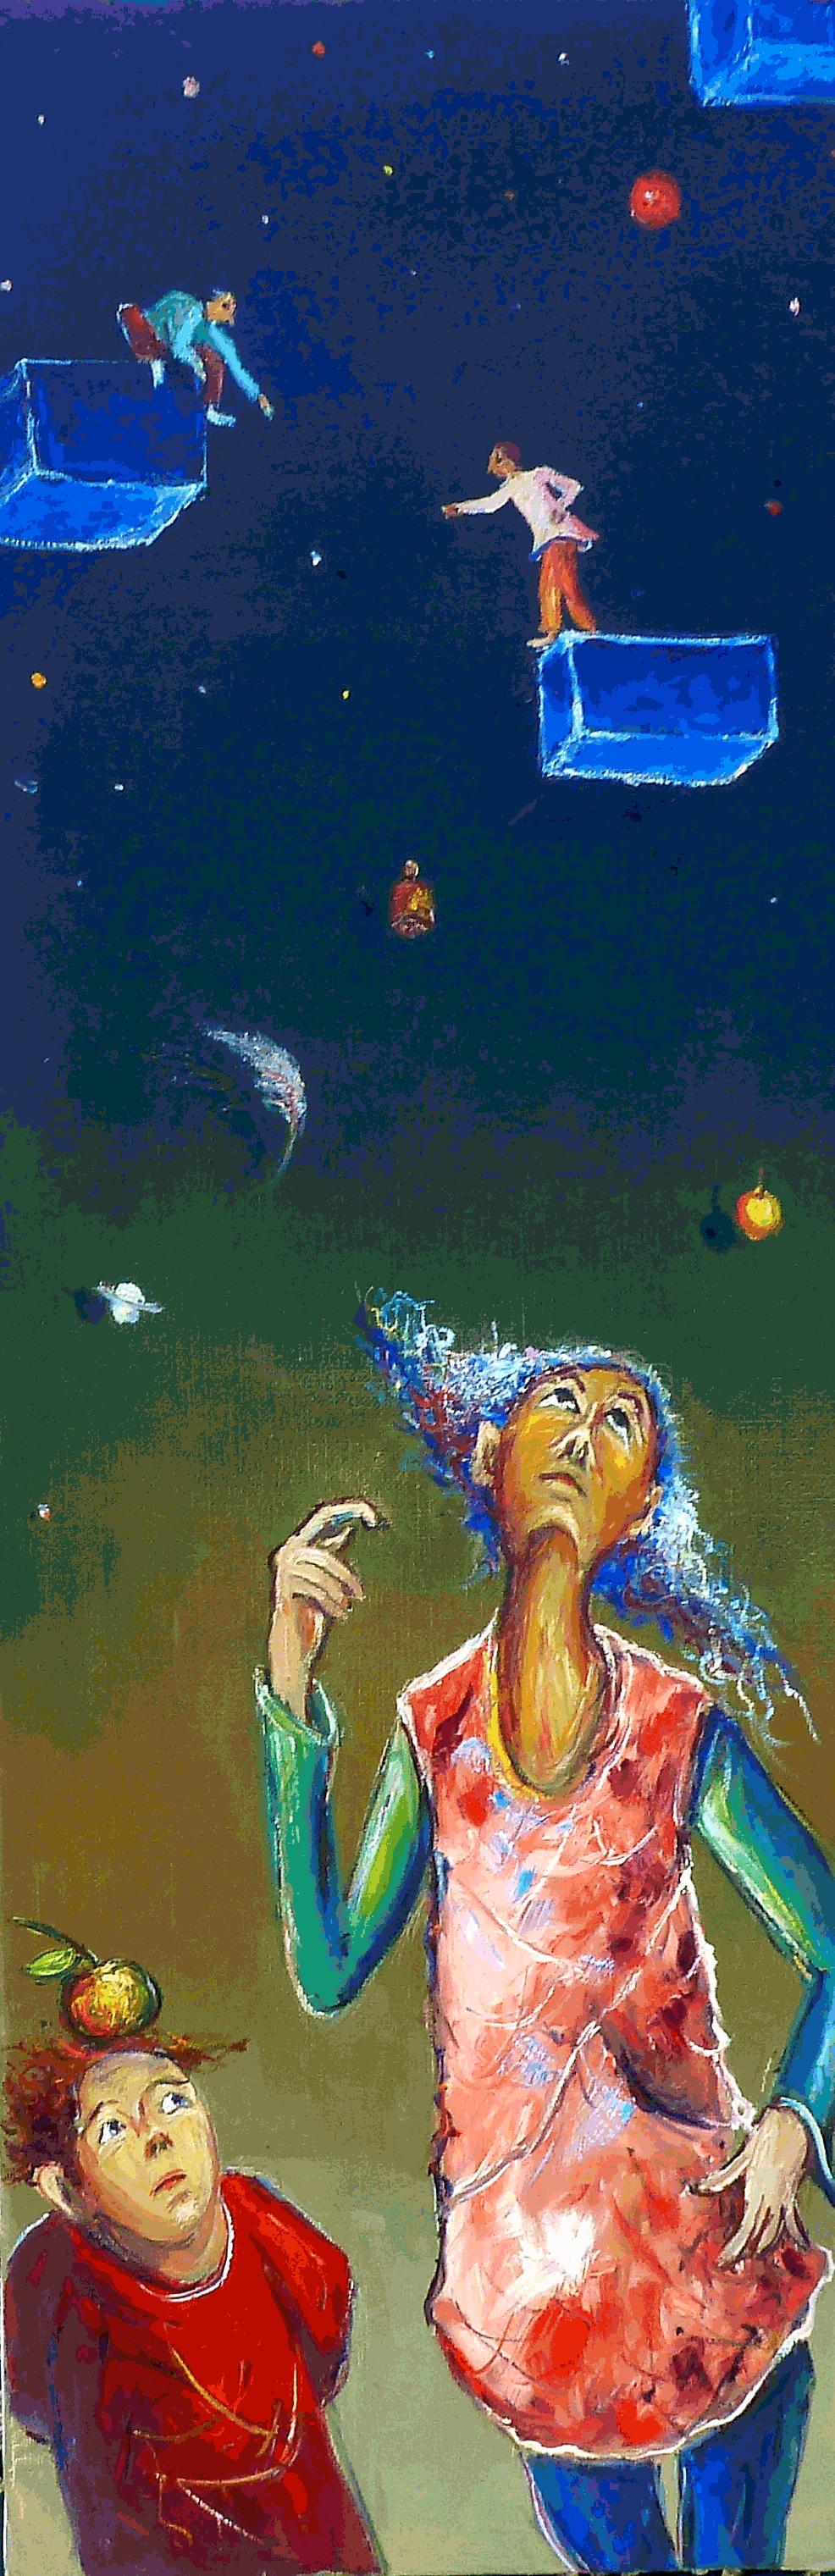 gravitation-25-75